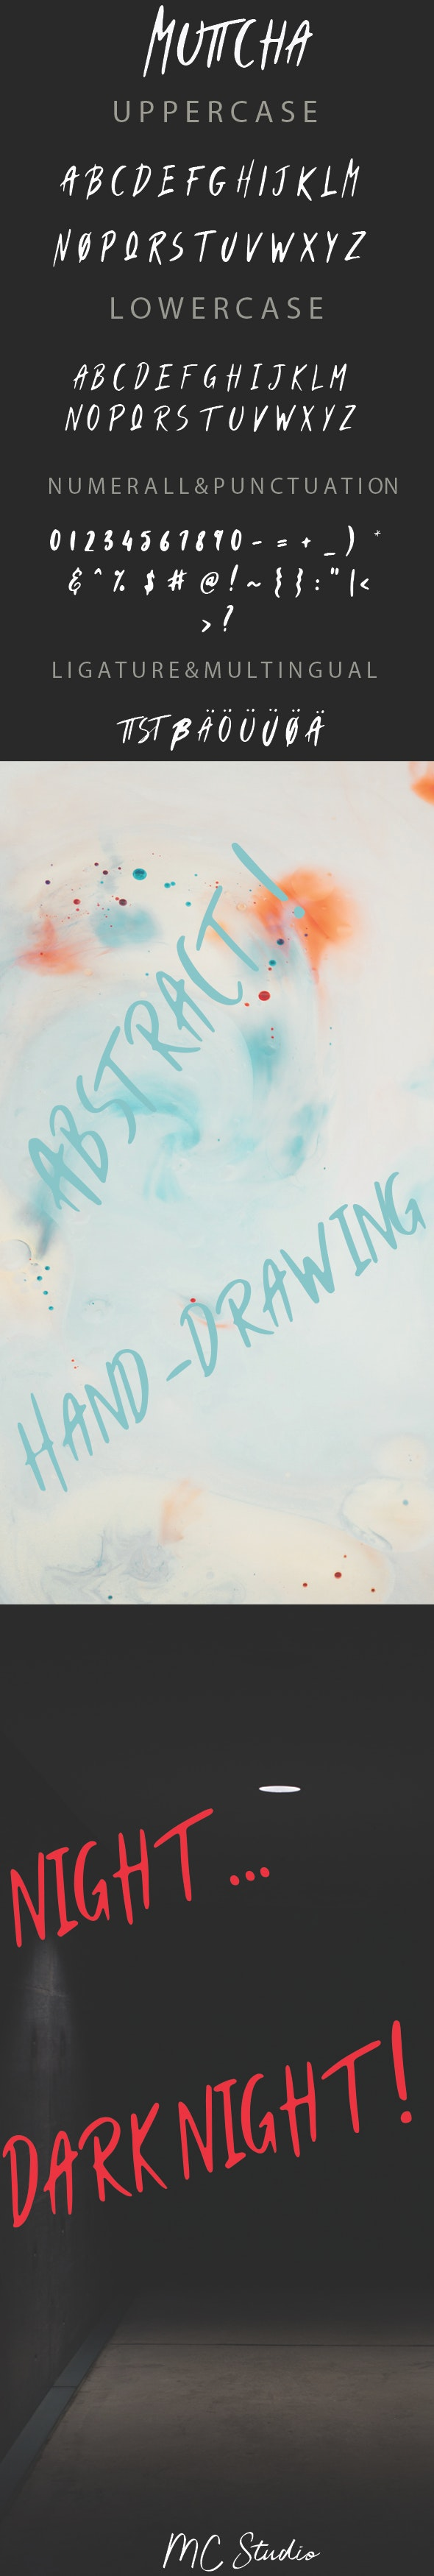 Muttcha - Hand-writing Script